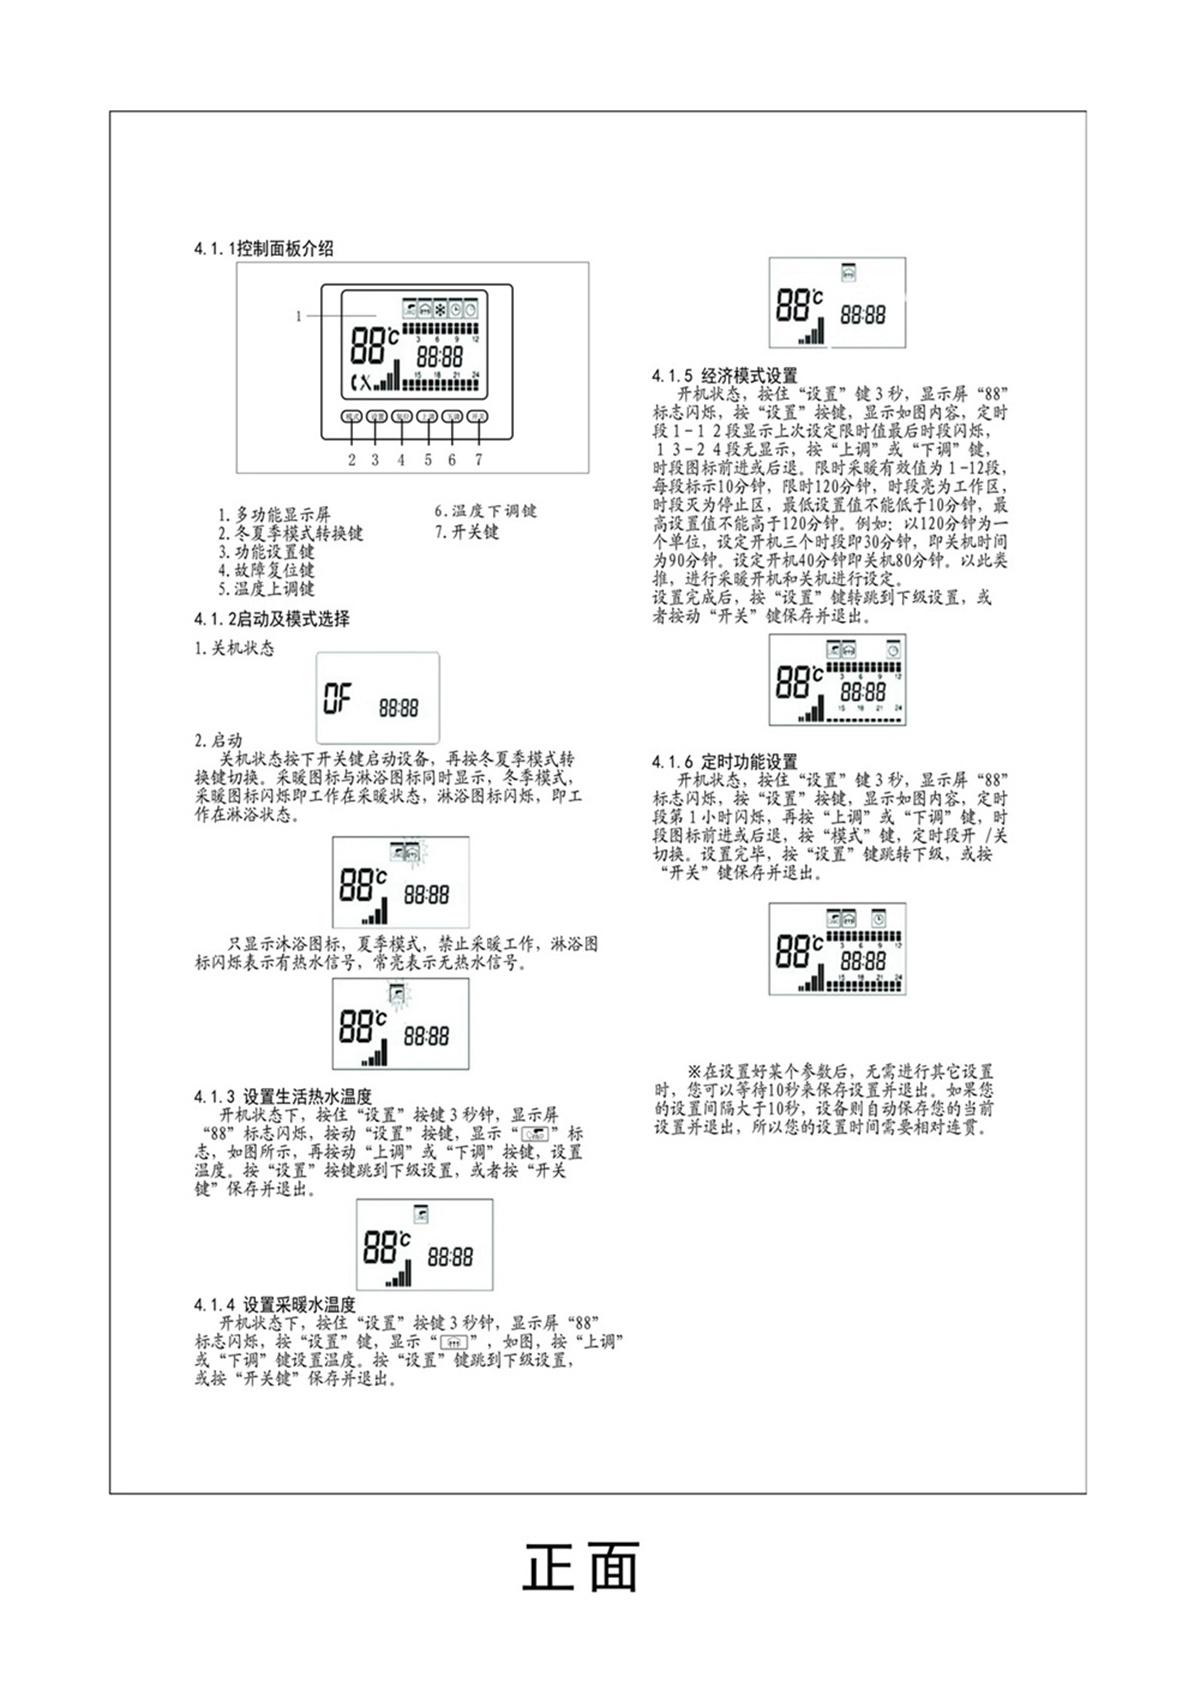 ES01系列-用户使用手册-10_01.jpg